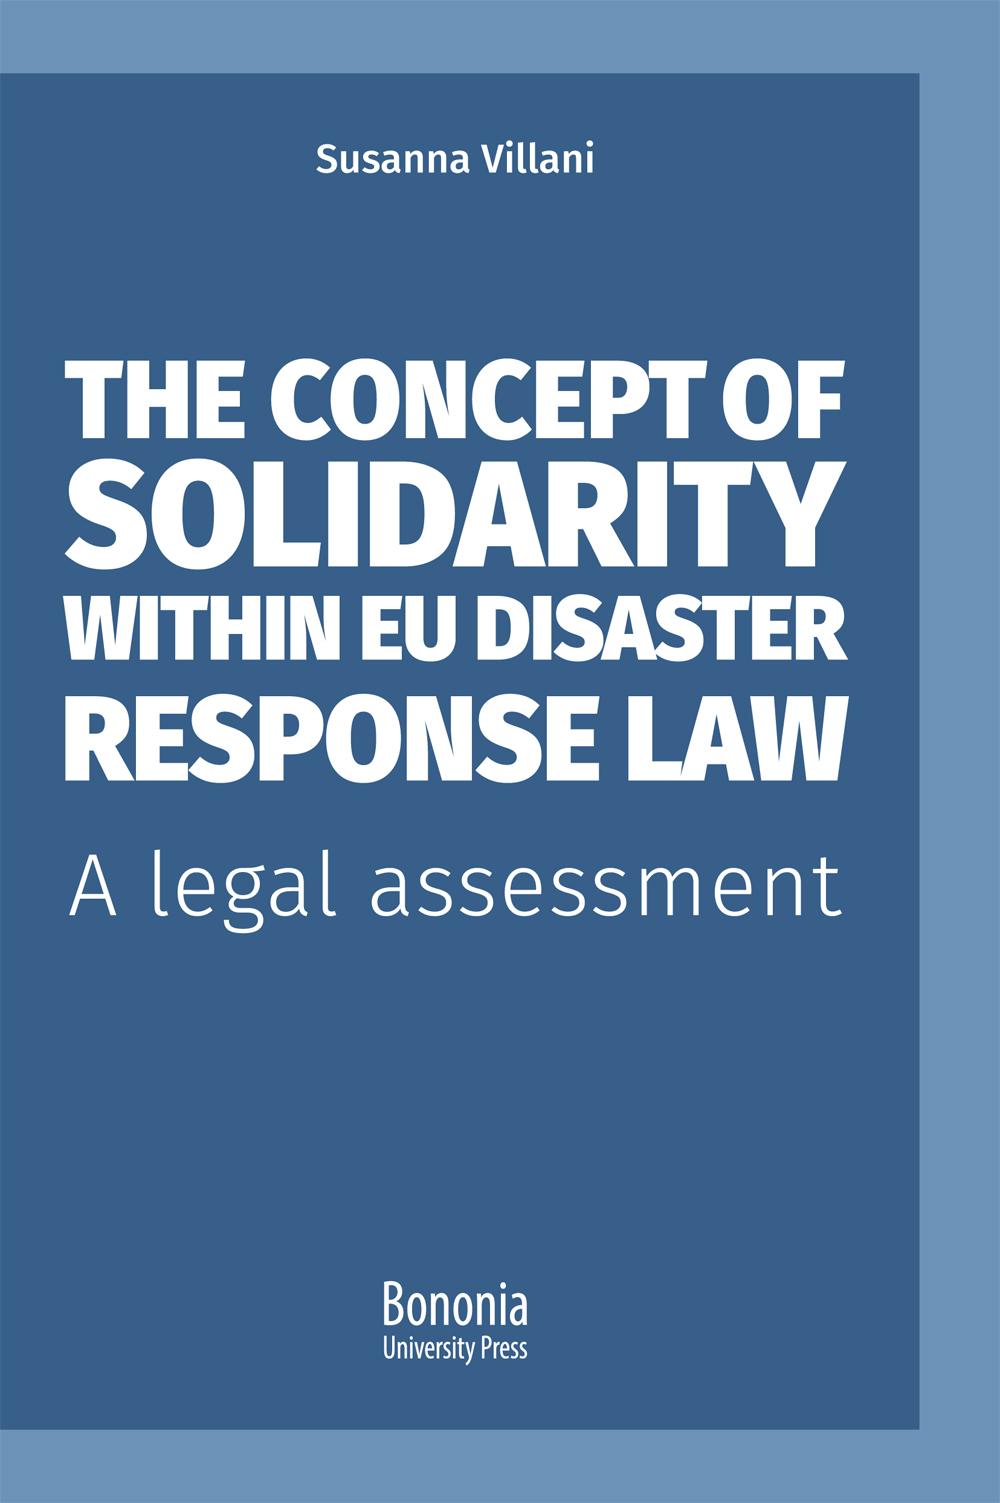 The concept of solidarity within EU disaster response law - Bononia University Press